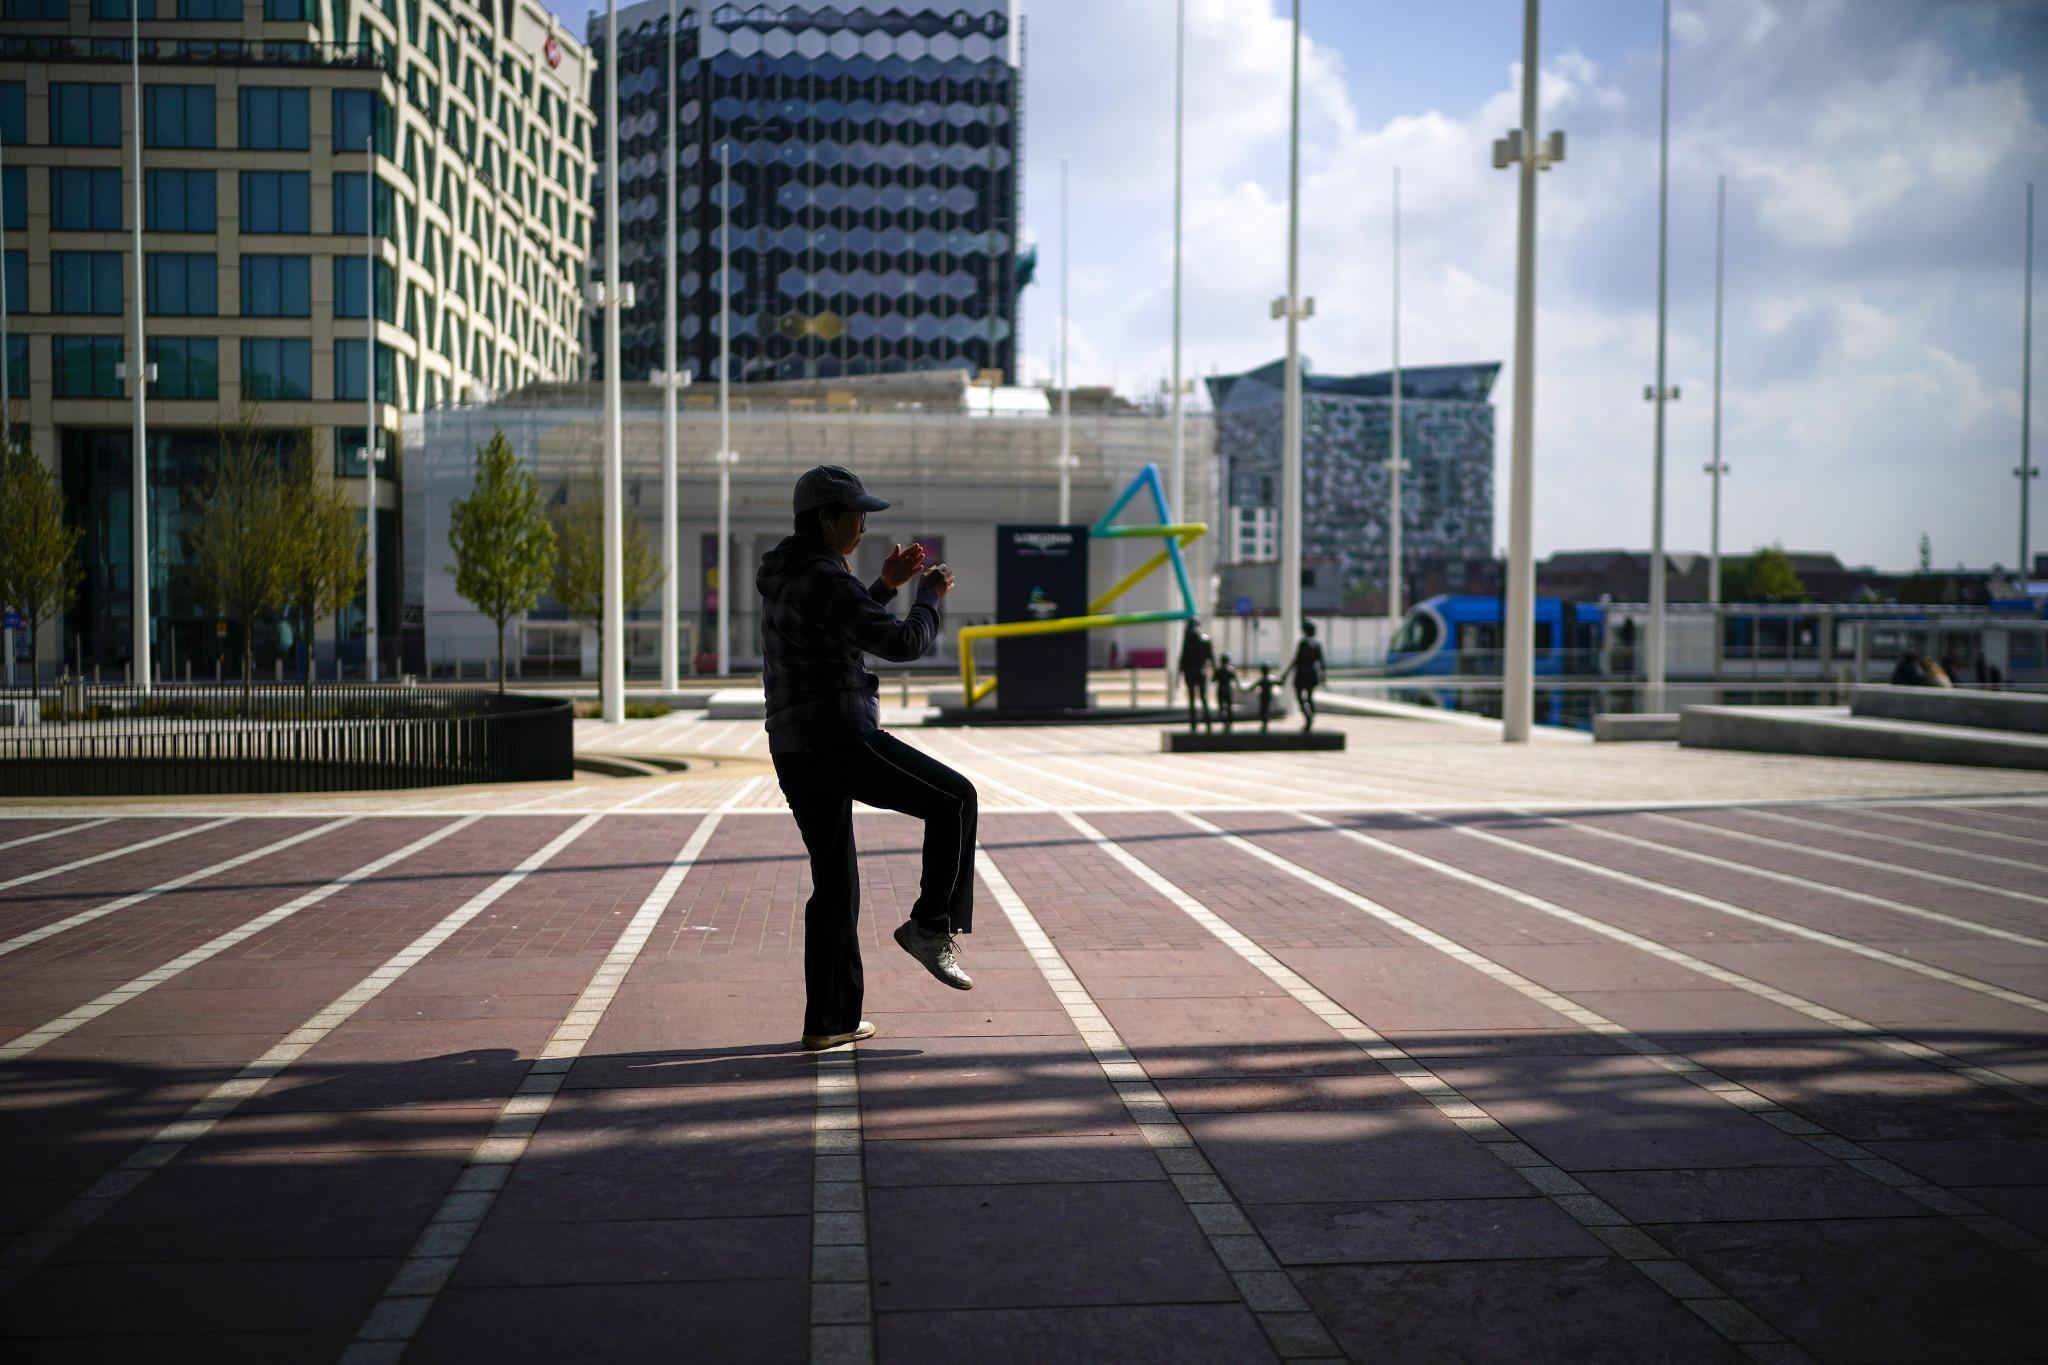 Birmingham is currently in its seventh week of coronavirus lockdown ©Getty Images